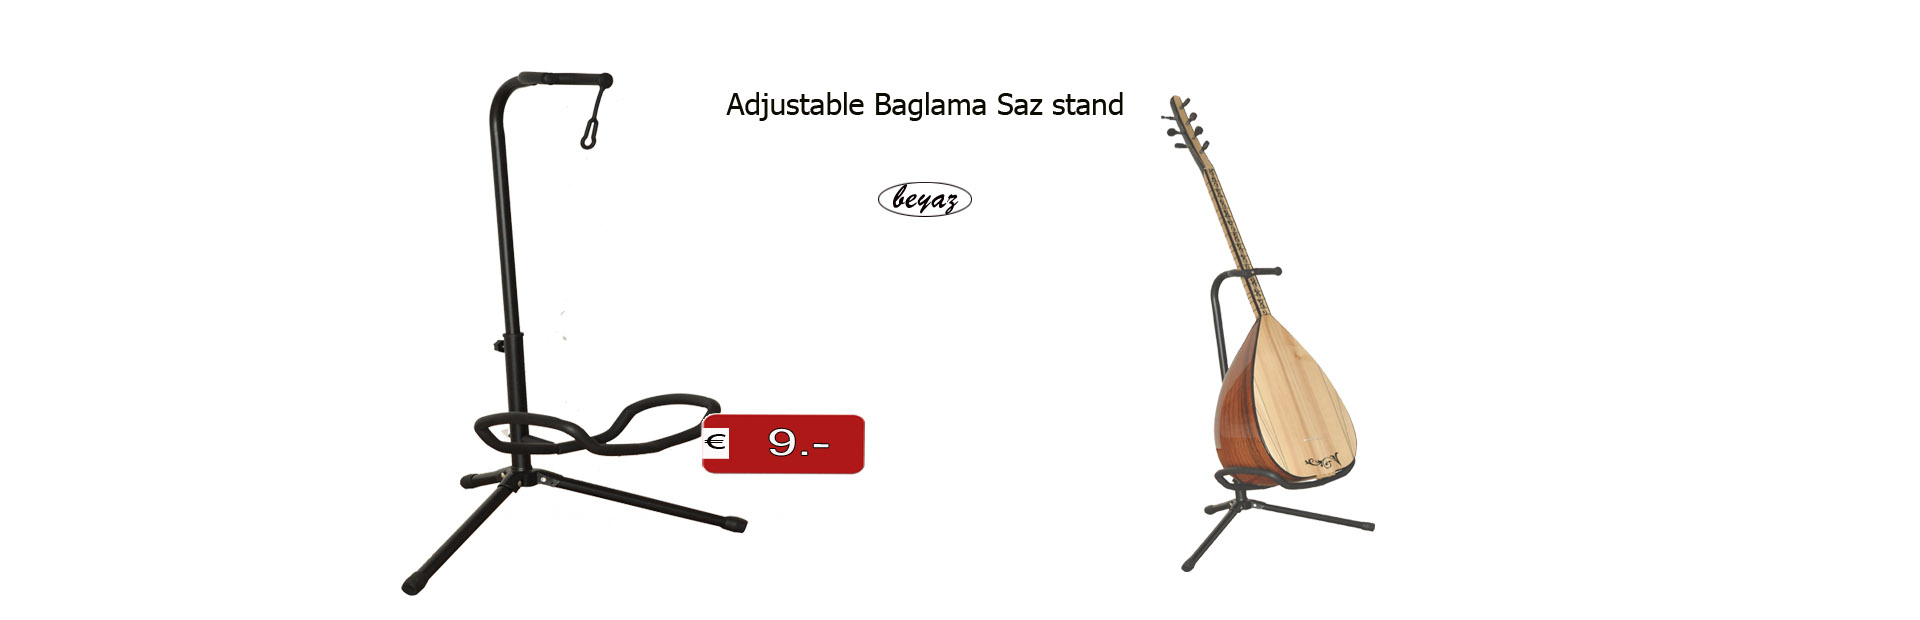 Baglama Saz Stand